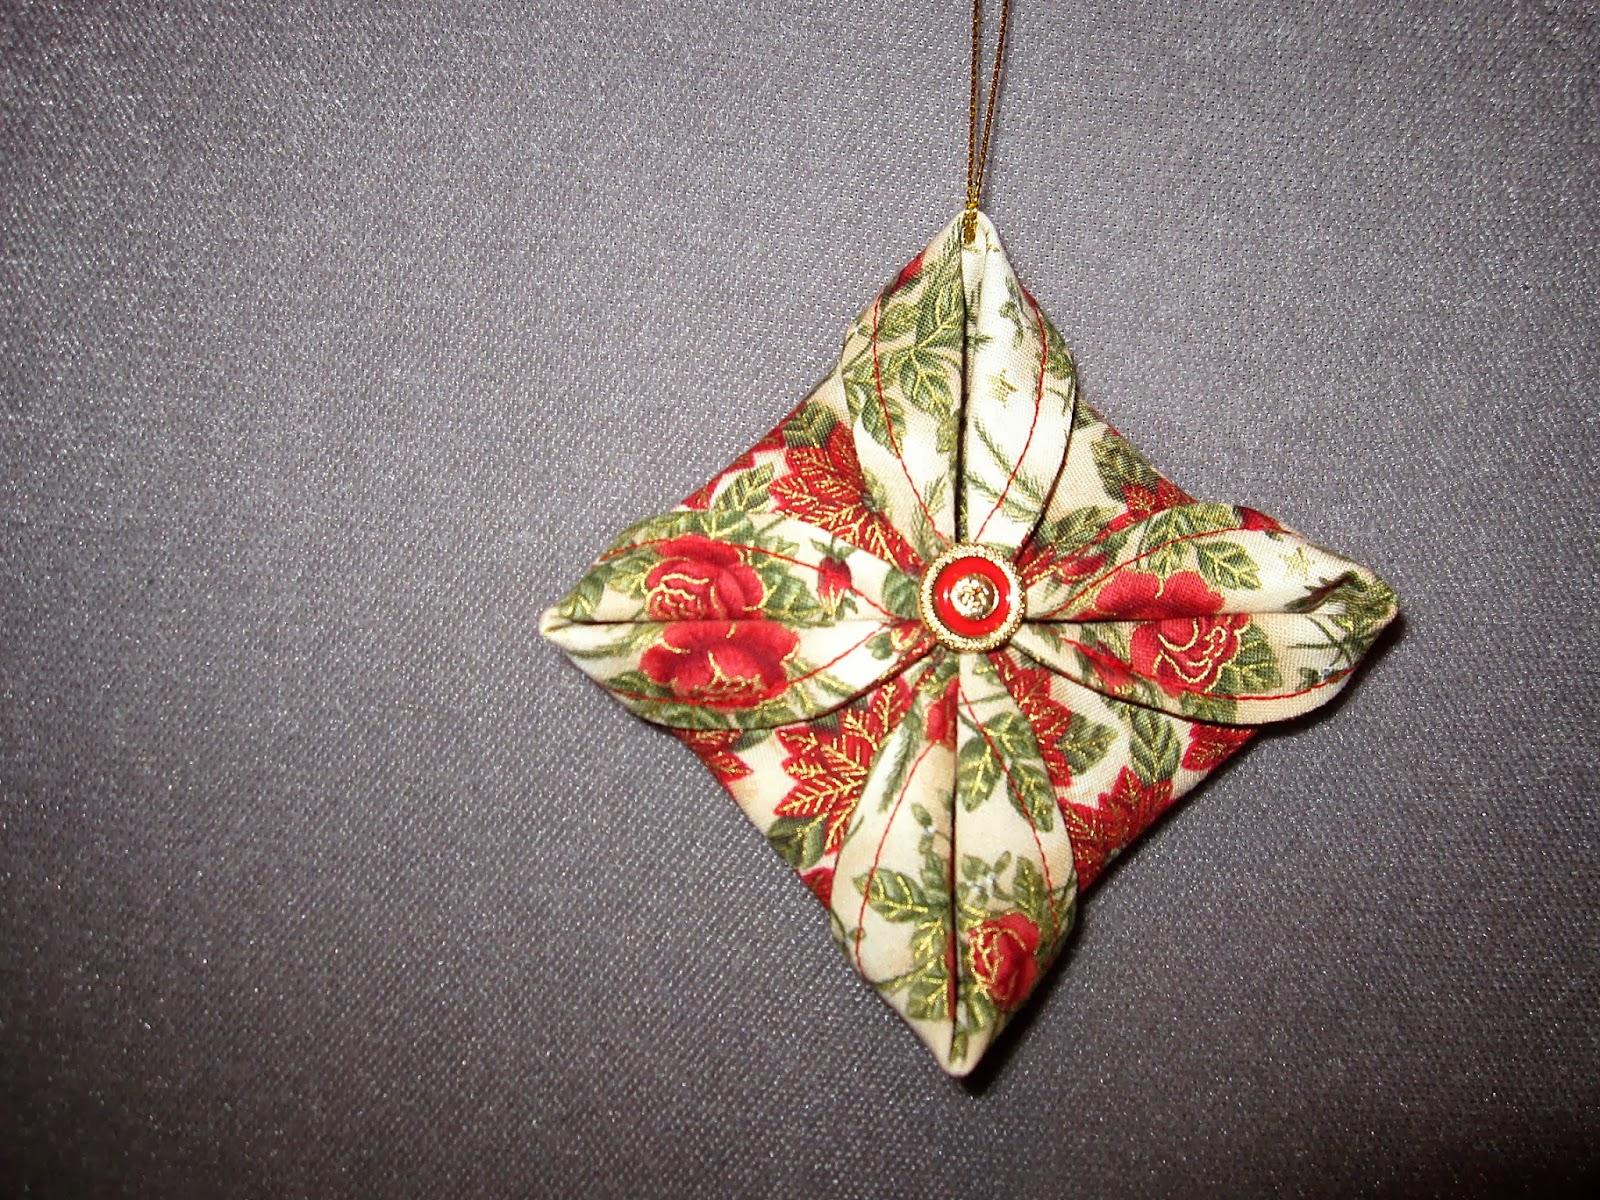 Fabric Ornaments Patterns : Createology: Fabric Circle Ornaments...